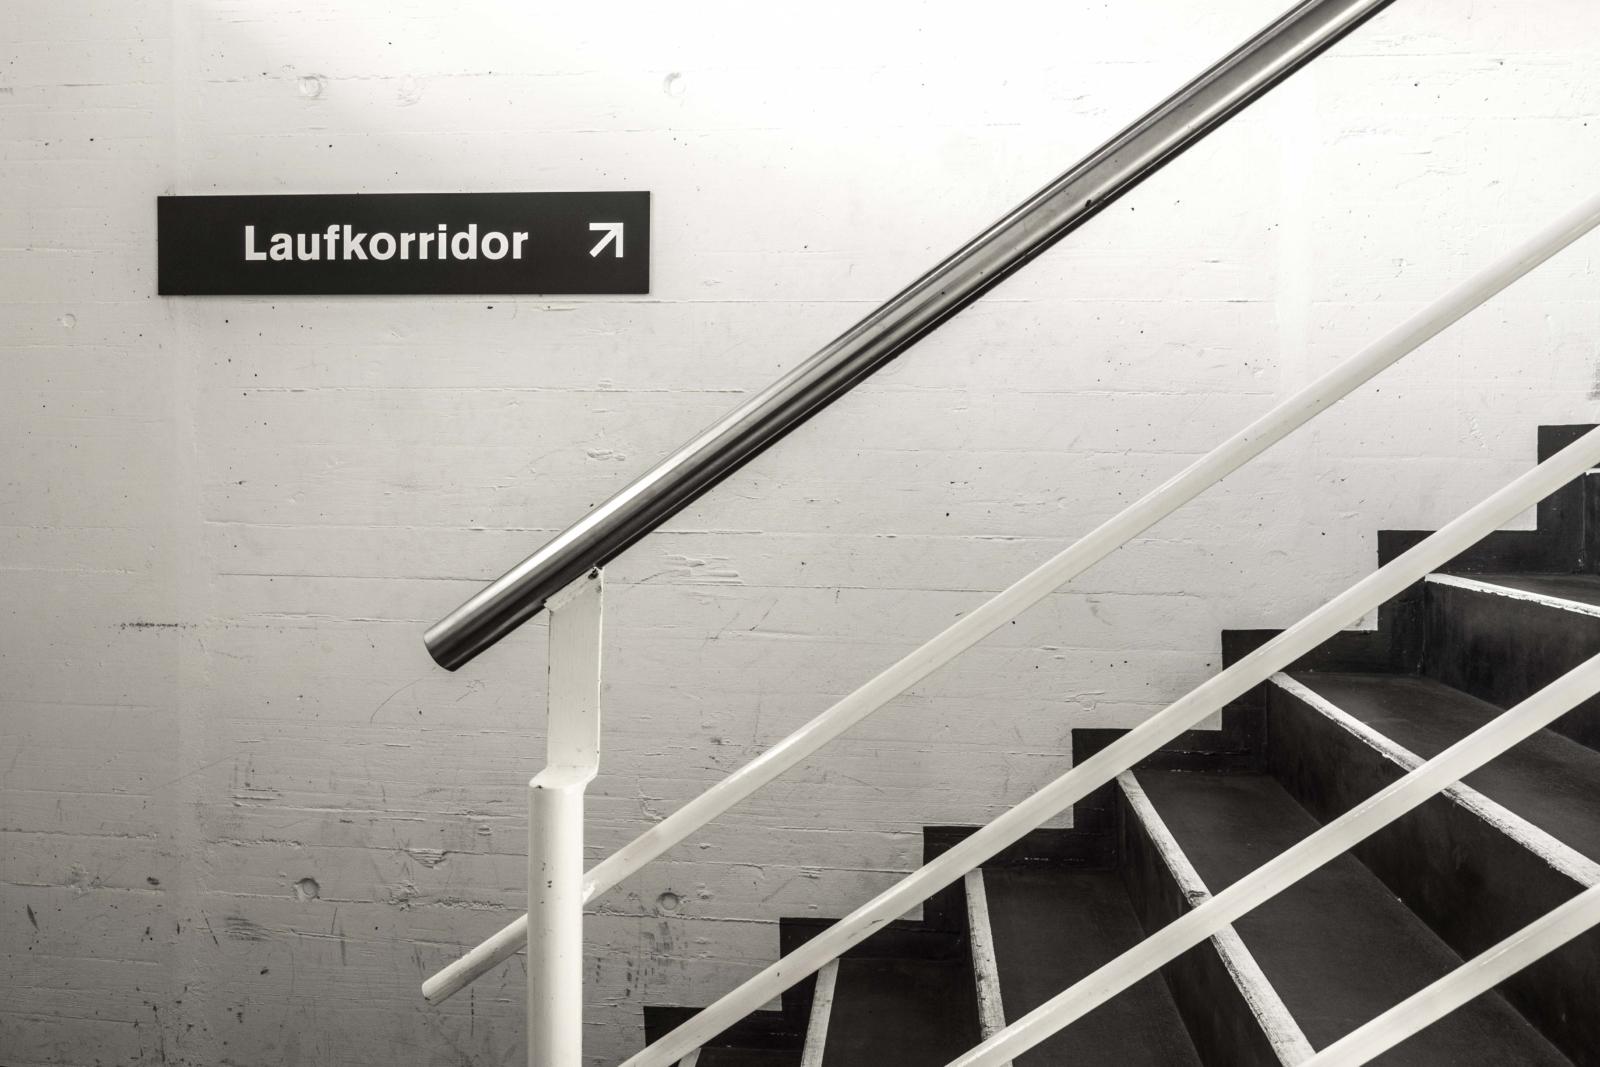 Laufkorridor